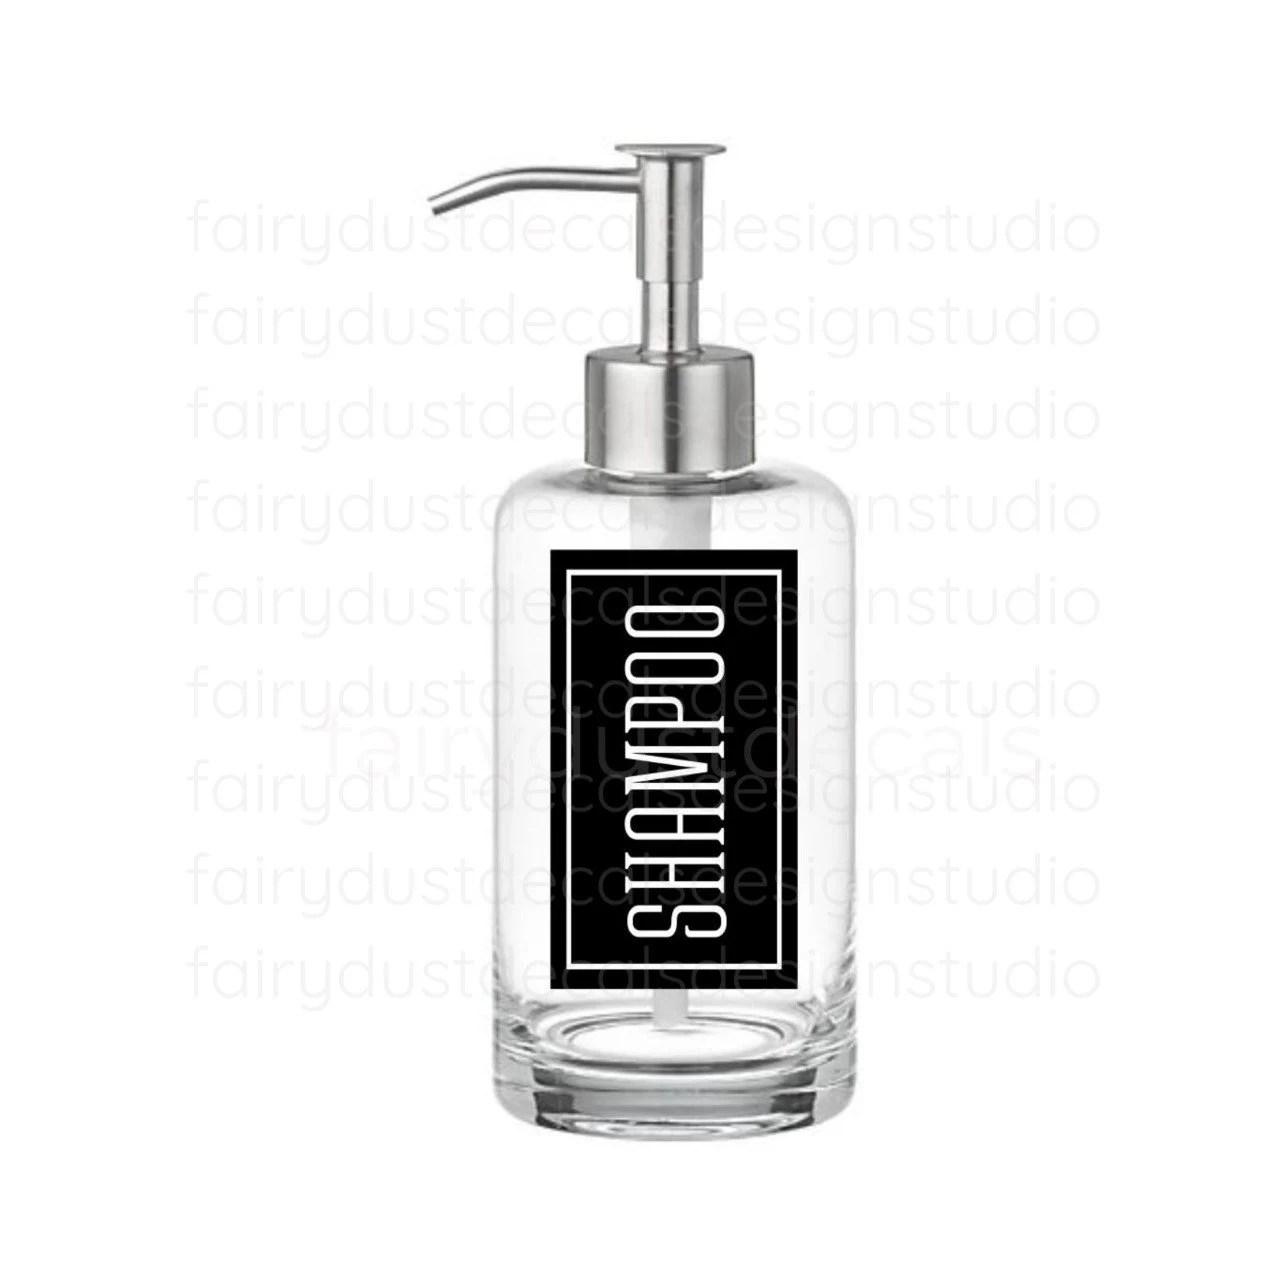 Shampoo Label For Dispenser Bottle Shampoo Vinyl Decal Hair Products Sticker For Glass Bottle